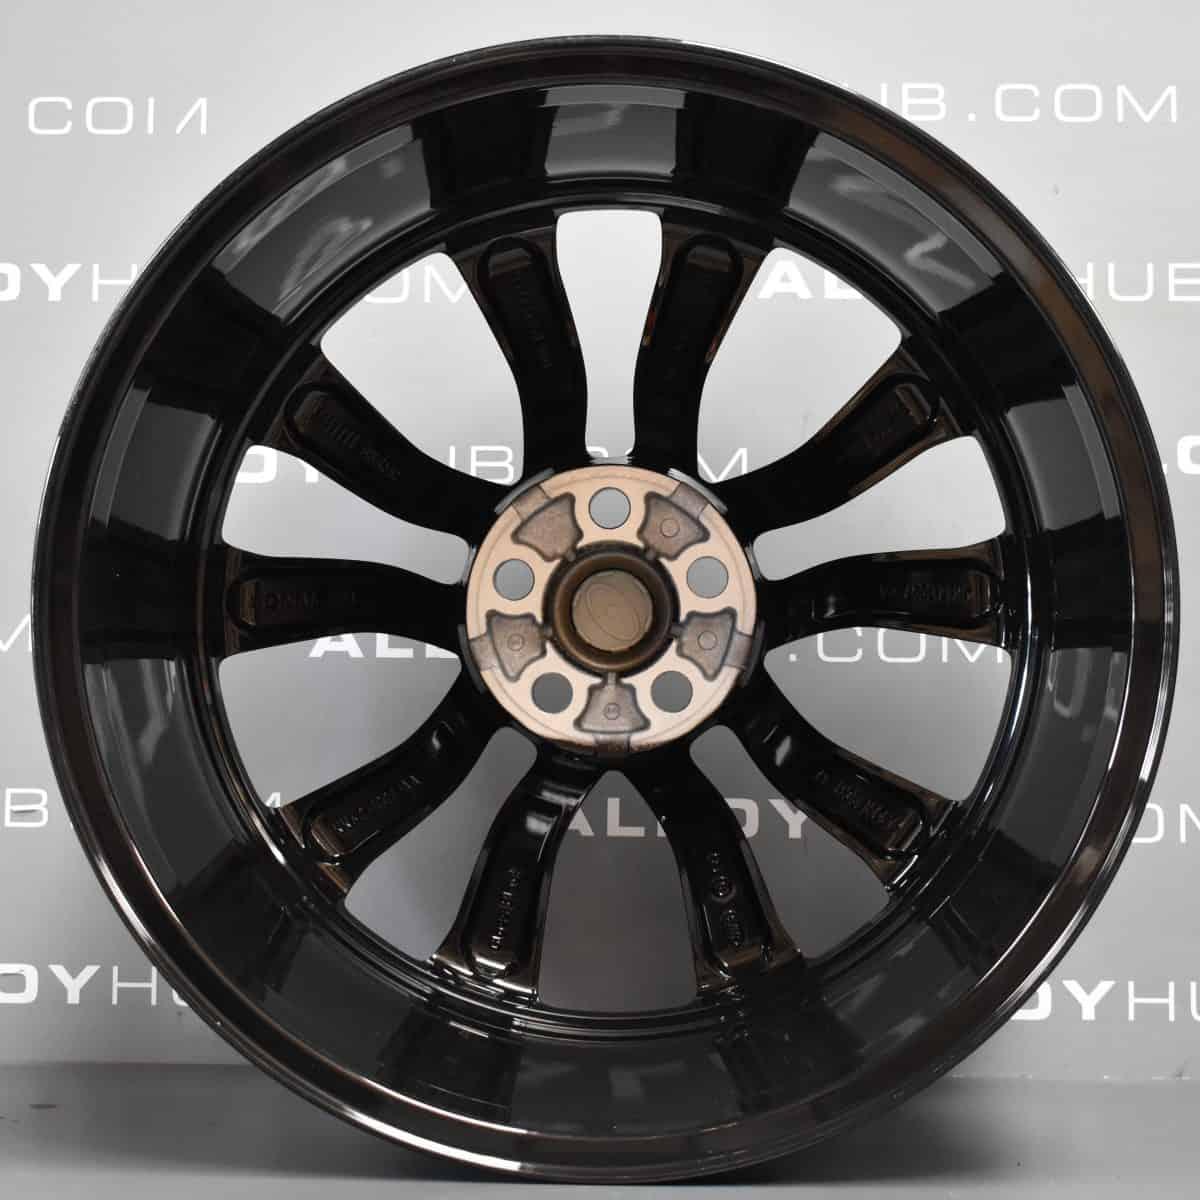 "Genuine Land Rover Range Rover Style 5086 5 Split-Spoke 22"" inch Alloy Wheels with Gloss Black Finish LR099144"